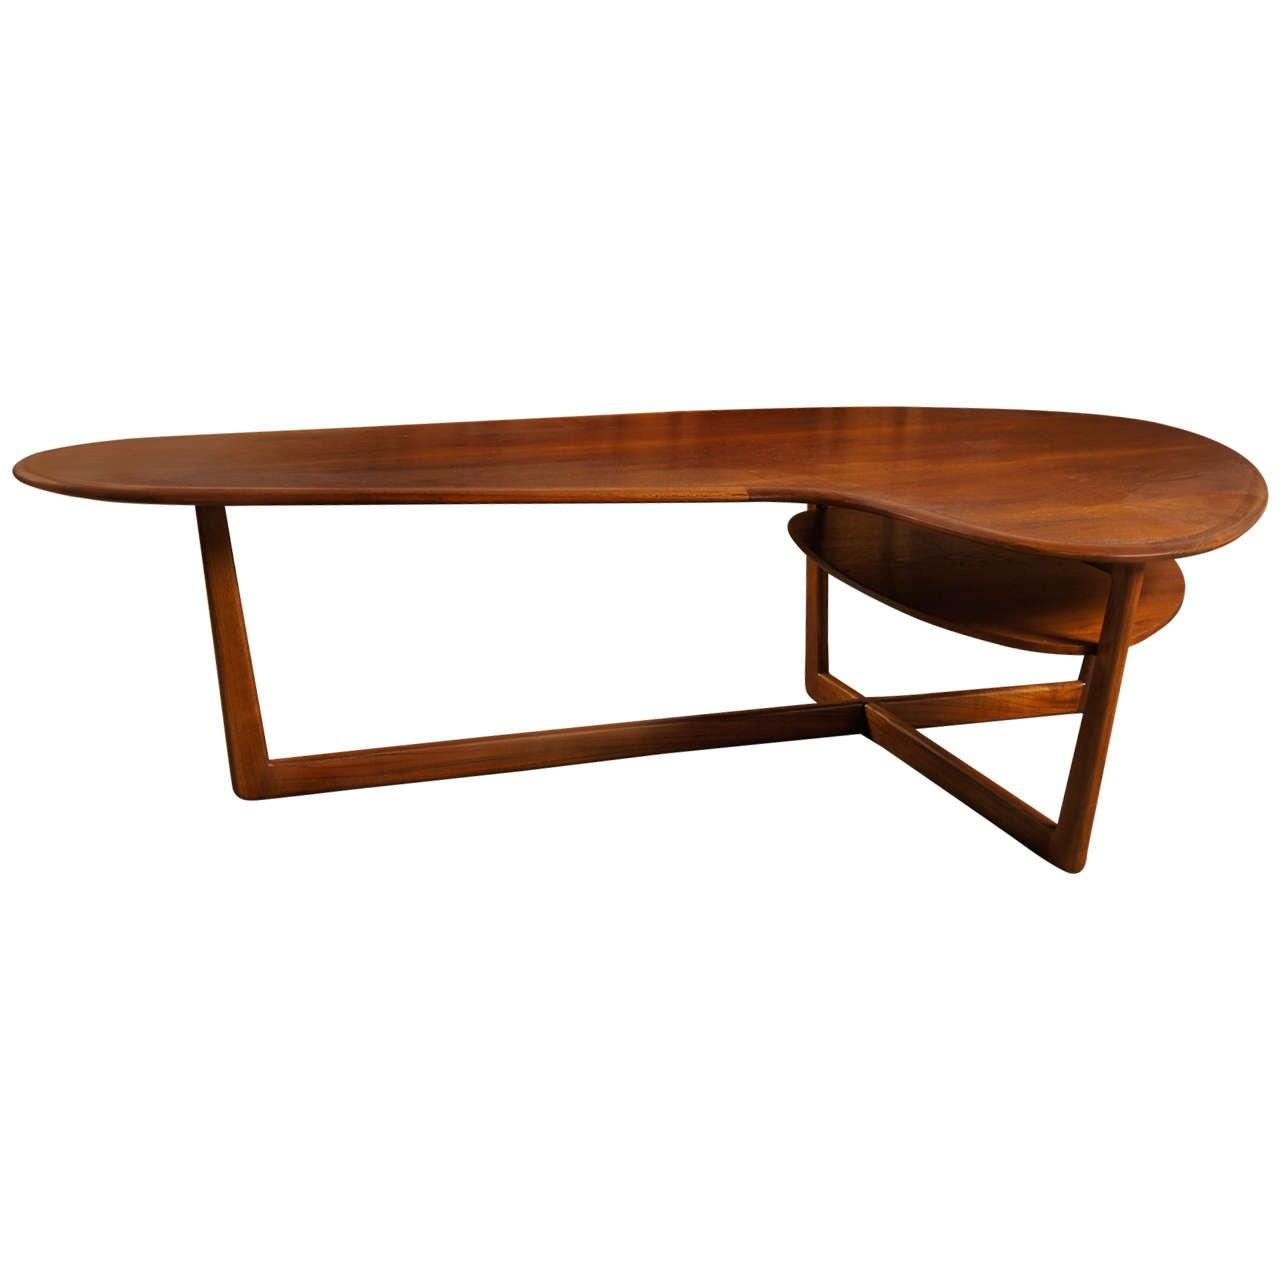 Boomerang Coffee Table at 1stdibs